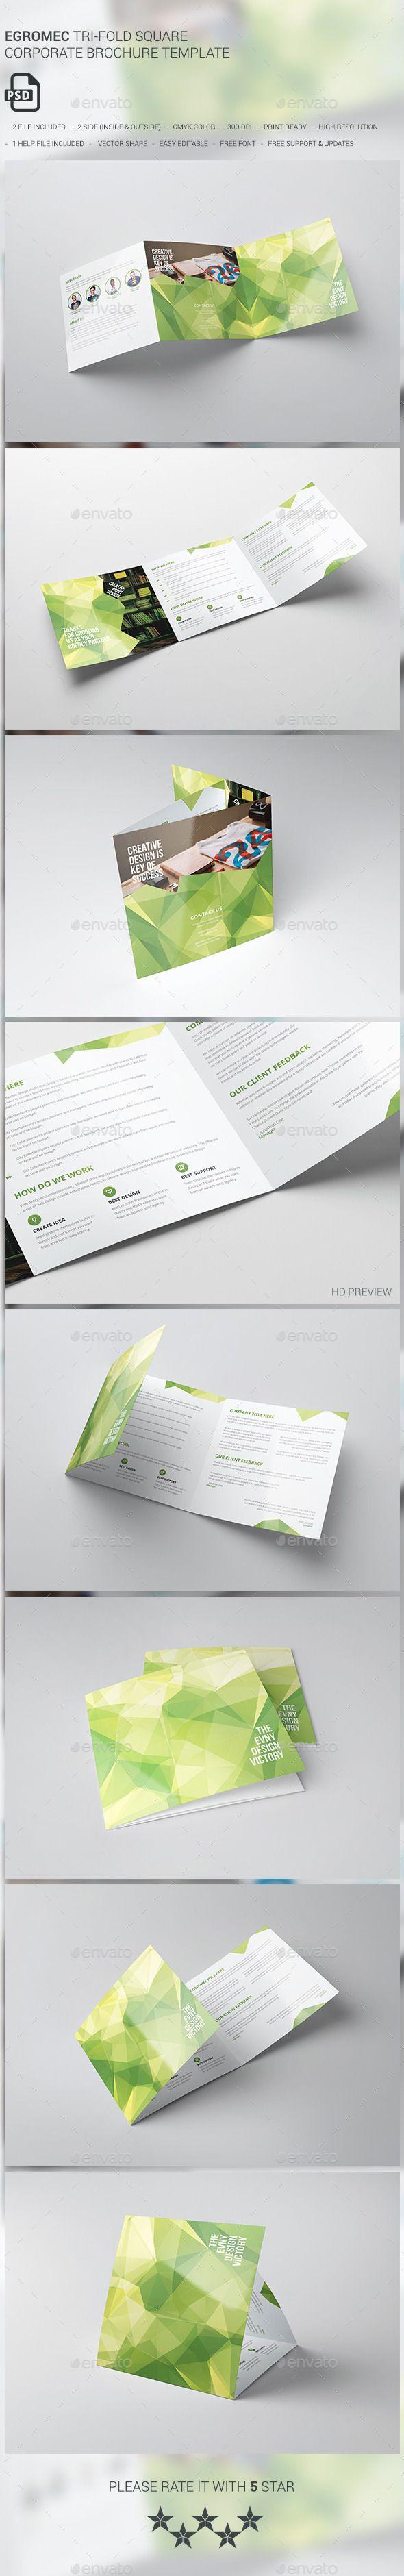 egromec square tri fold brochure tri fold tri fold brochure and